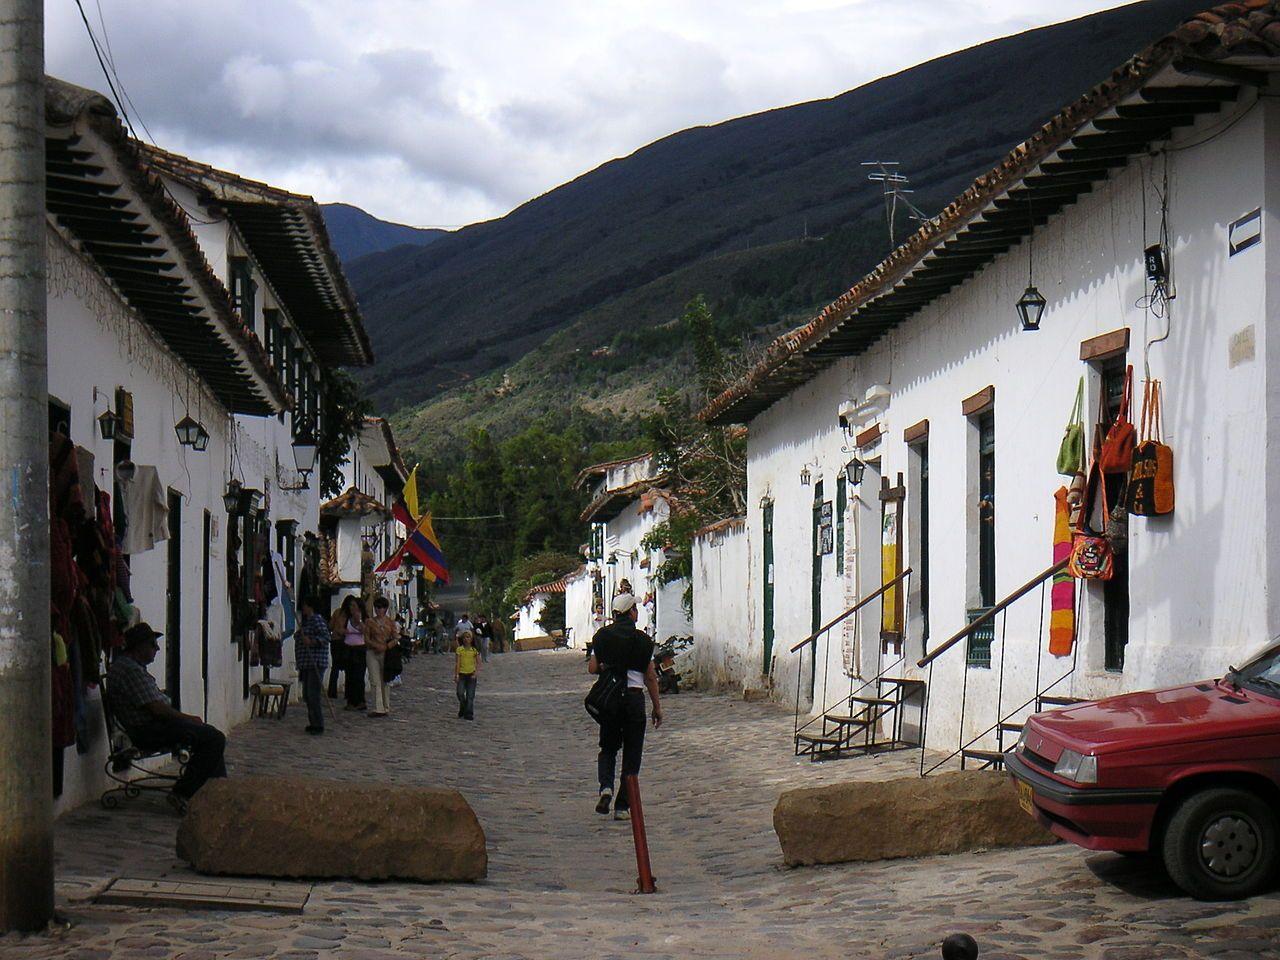 Villa de leiva colombia